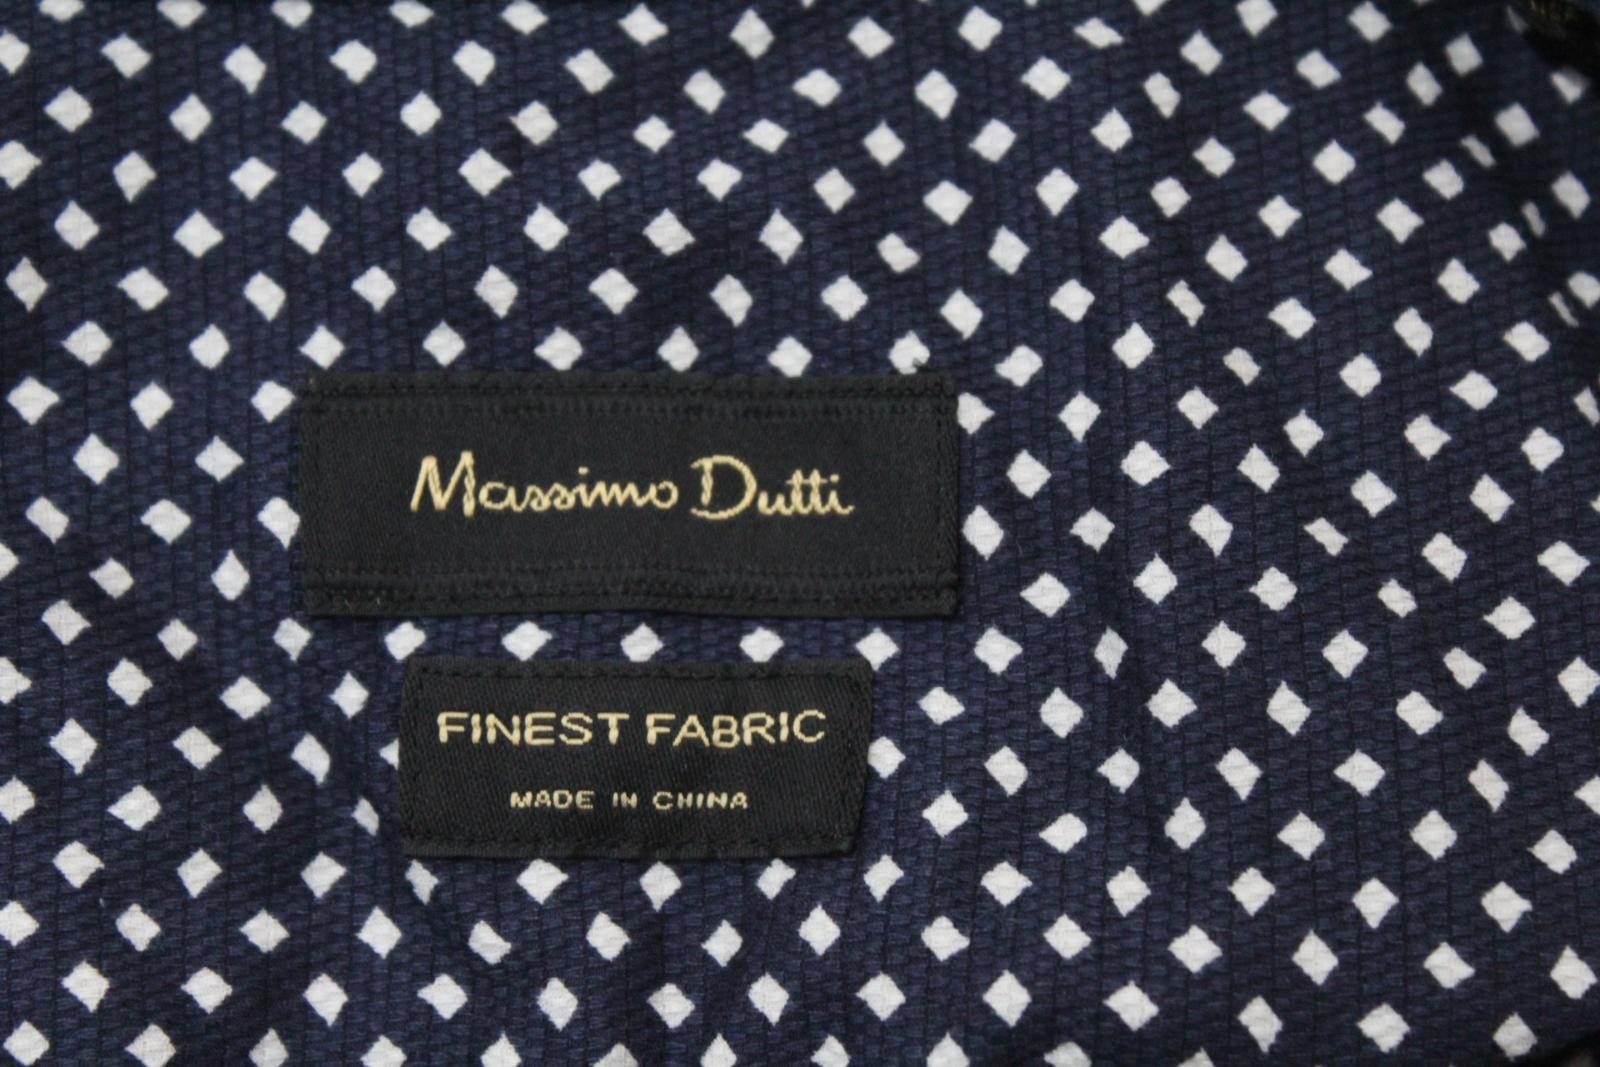 Massimo-Dutti-Para-hombres-Mangas-Largas-Azul-Marino-Marfil-Impreso-informal-camisa-tamano-XL miniatura 8